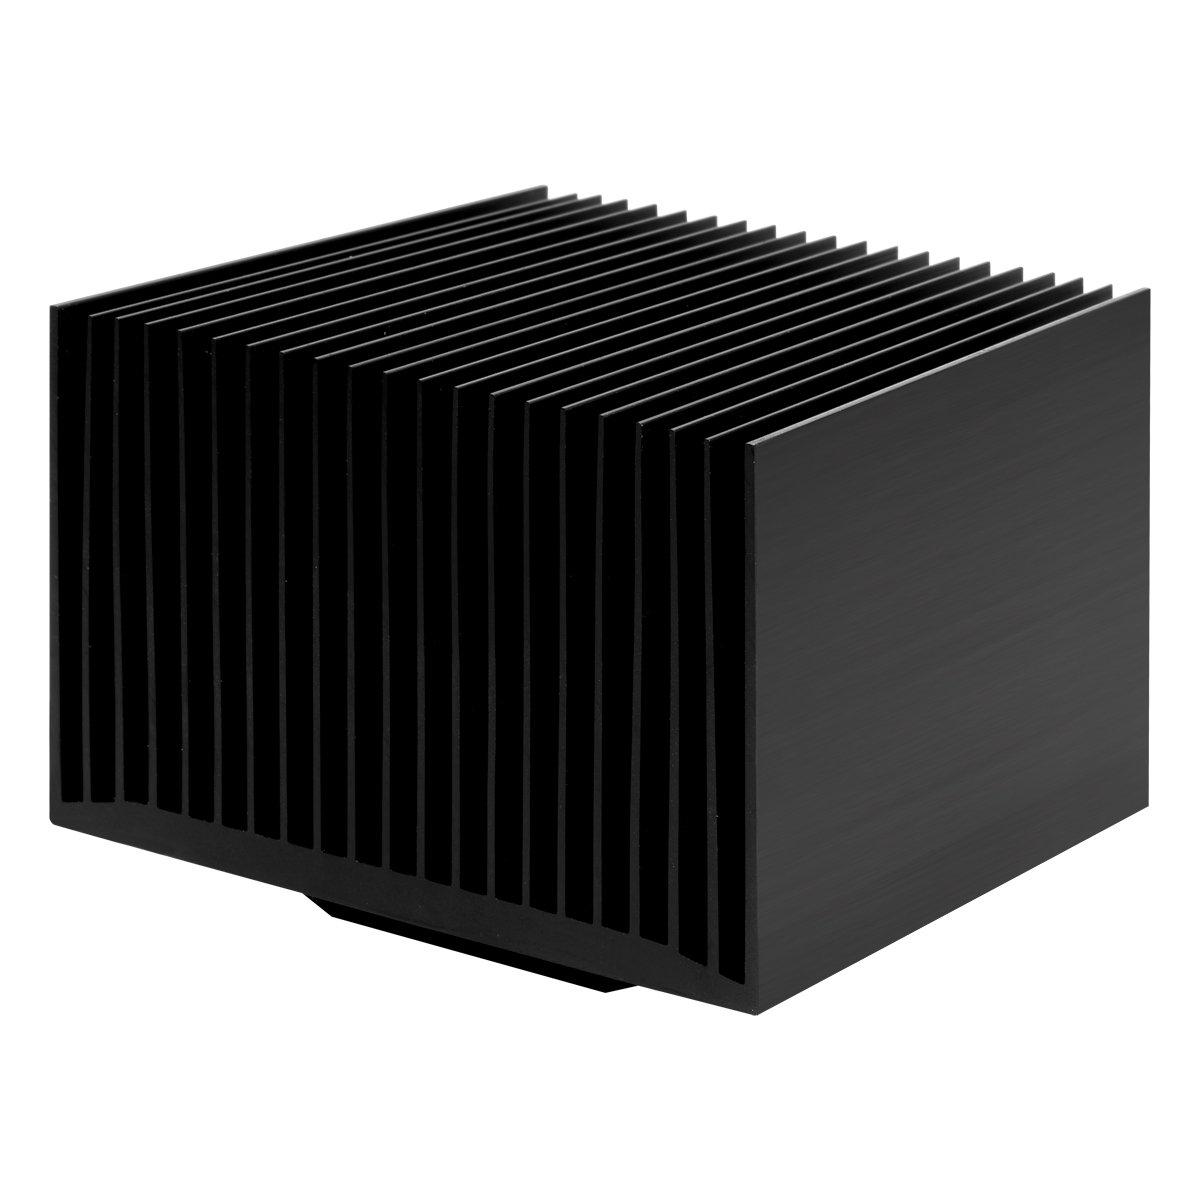 ARCTIC Alpine AM4 Passive - Silent CPU Cooler for AMD AM4